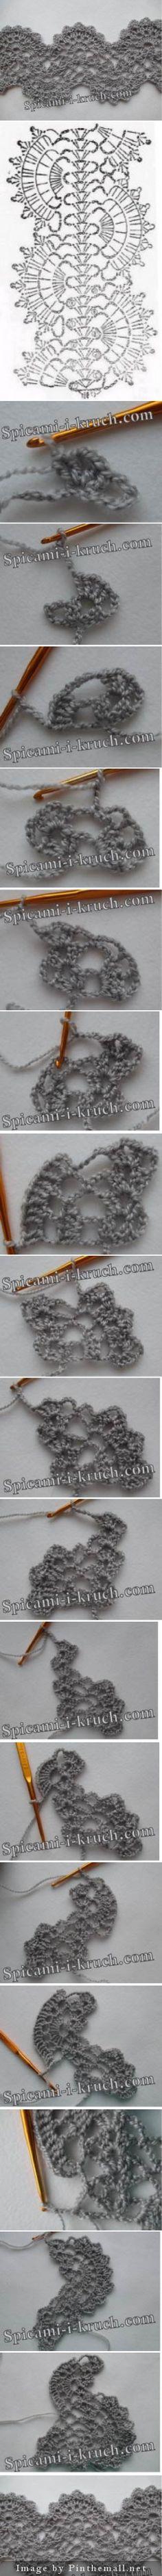 Crochet lace tape shells & scallops Every step included ~~~ Source: http://spicami-i-kruch.com/sharfik-iz-lentochnogo-kruzheva/